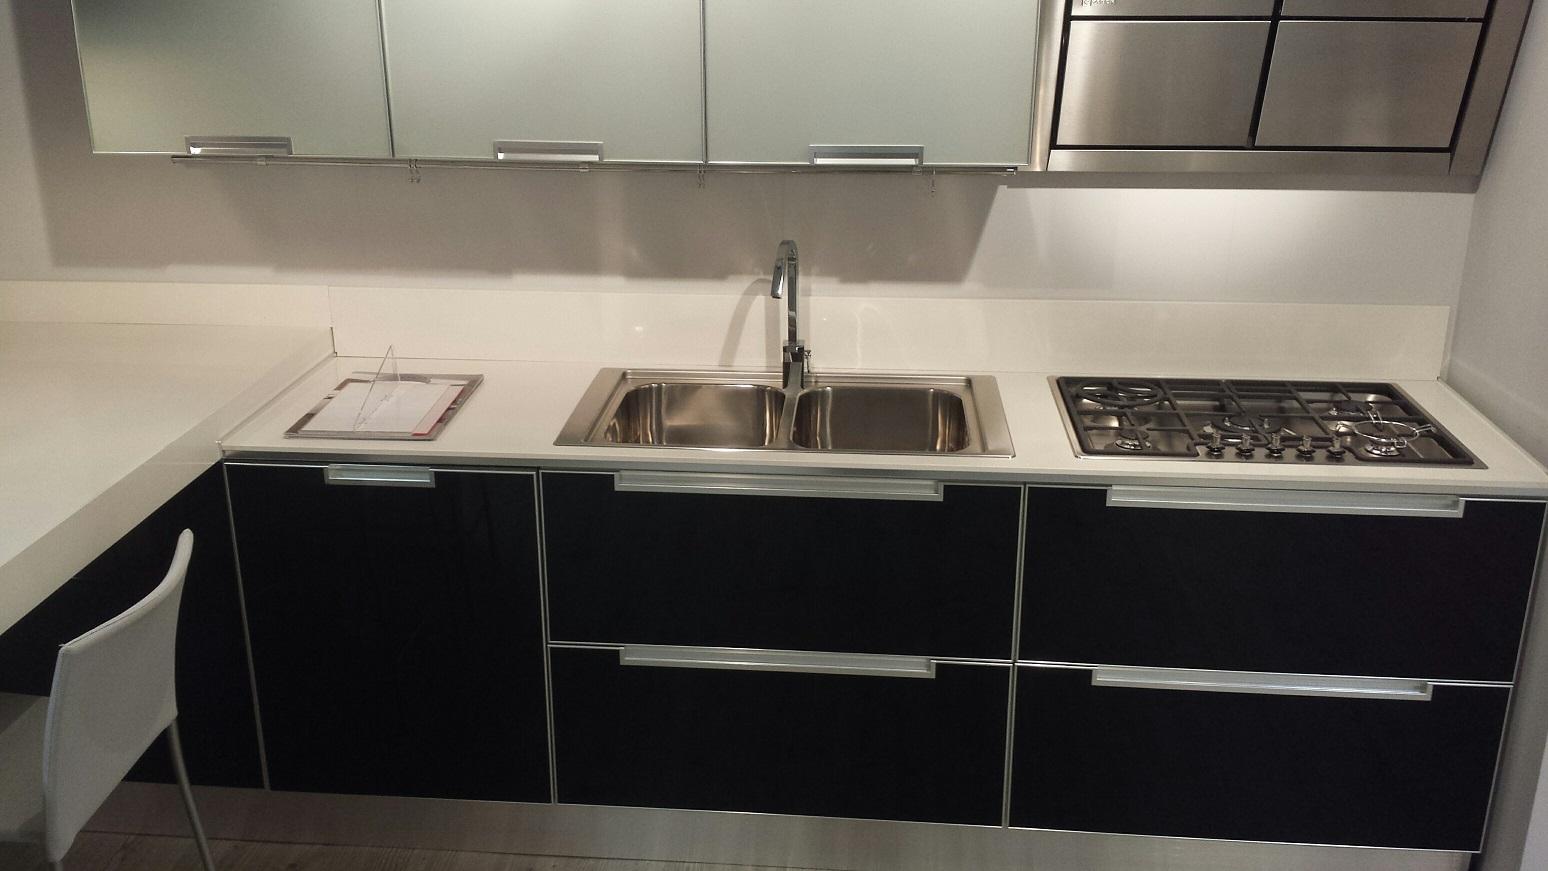 Perfect Cassetti Cucina U Trapani Elettrici With Accessori Cassetti Cucina  With Accessori Cucina Scavolini